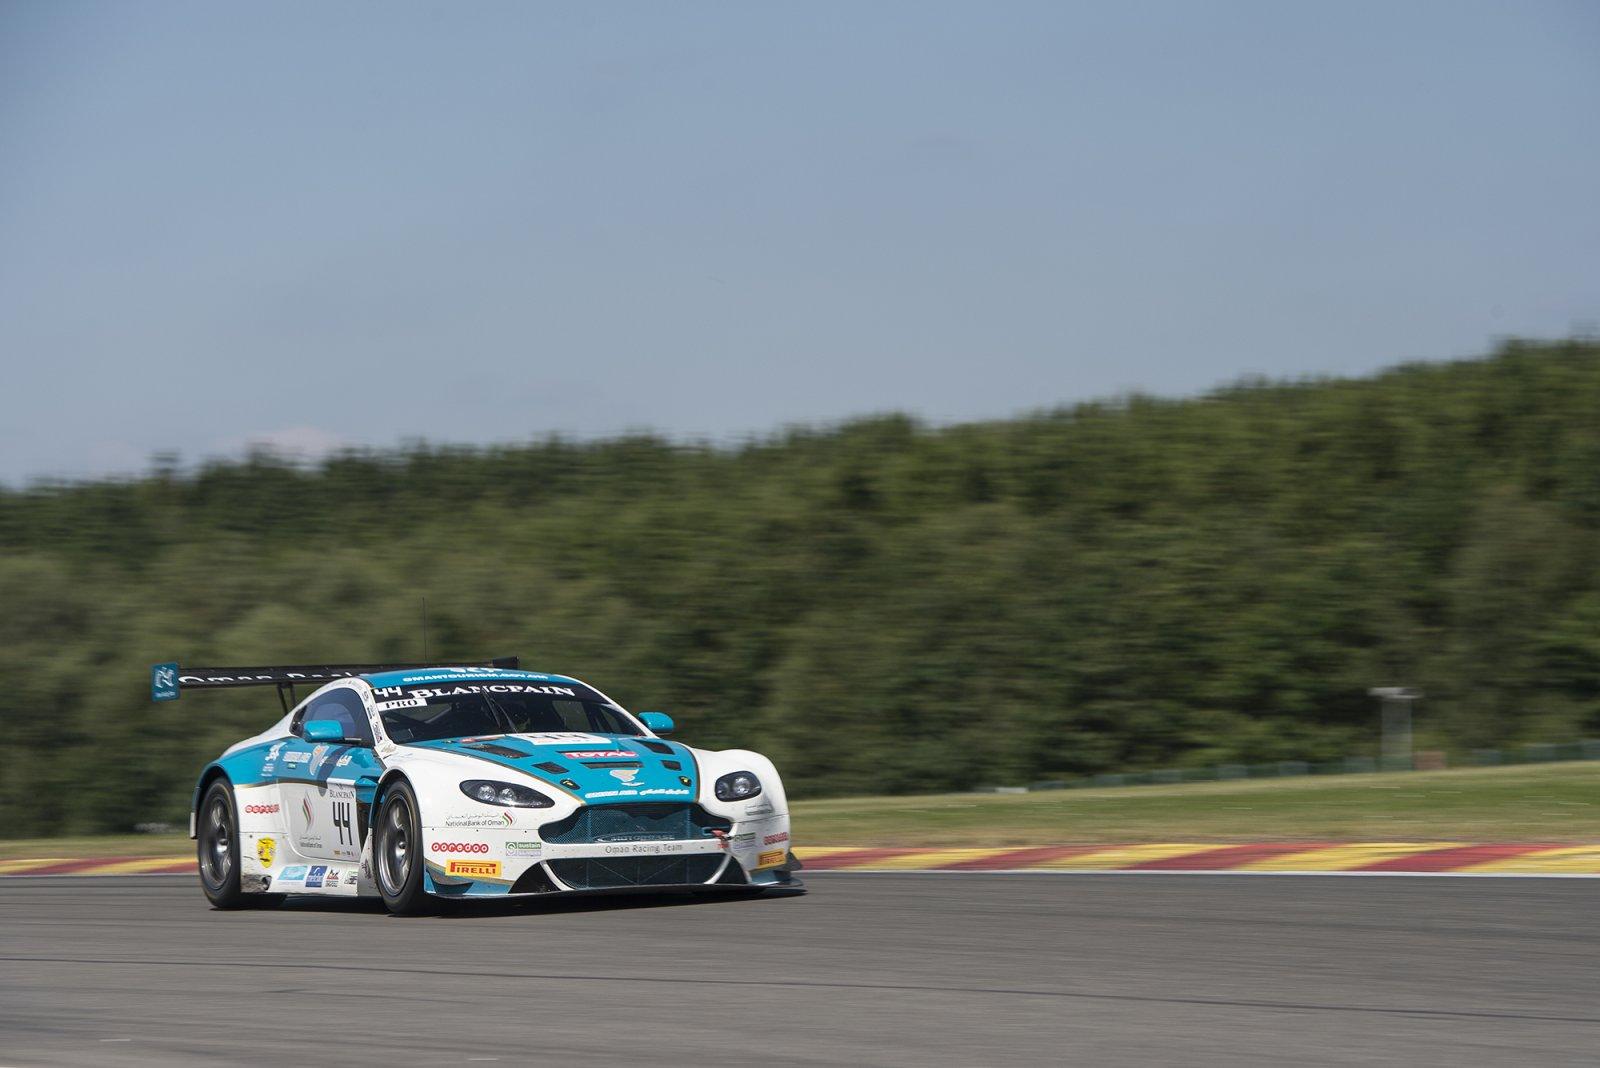 Daniel Lloyd joins Oman Racing for Blancpain Endurance Series